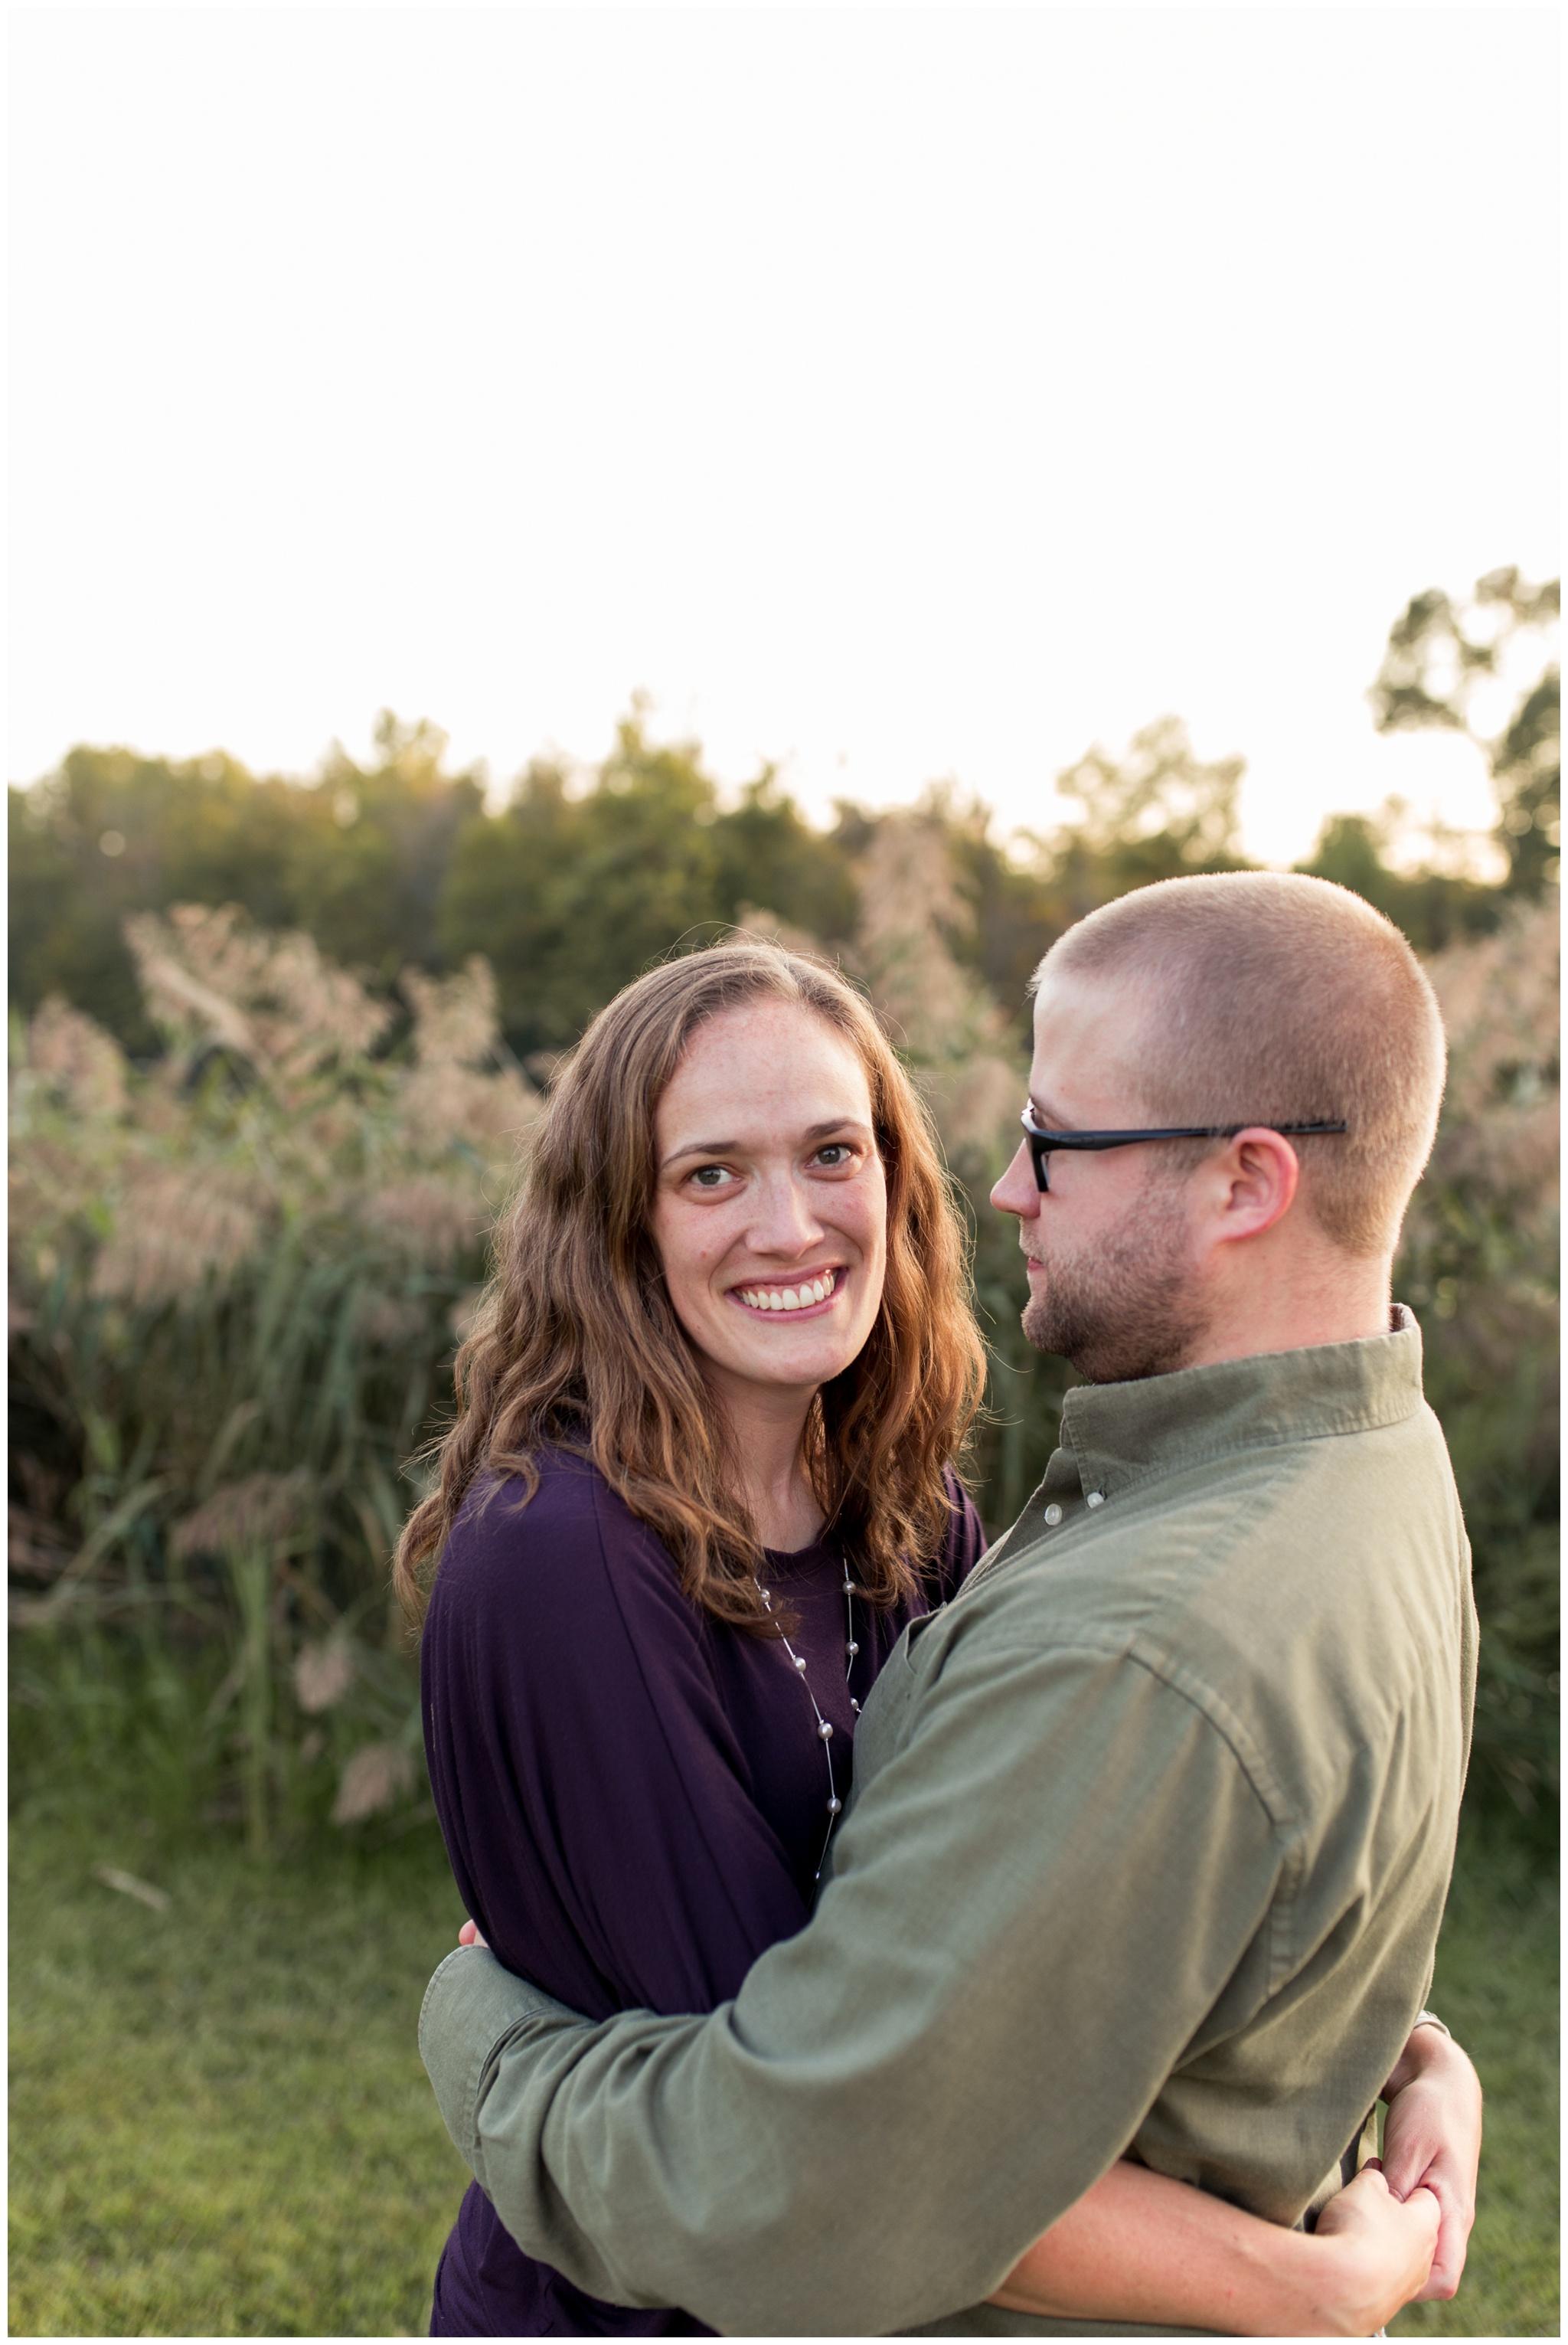 couples portraits at Wildcat Creek Reservoir Park in Kokomo Indiana